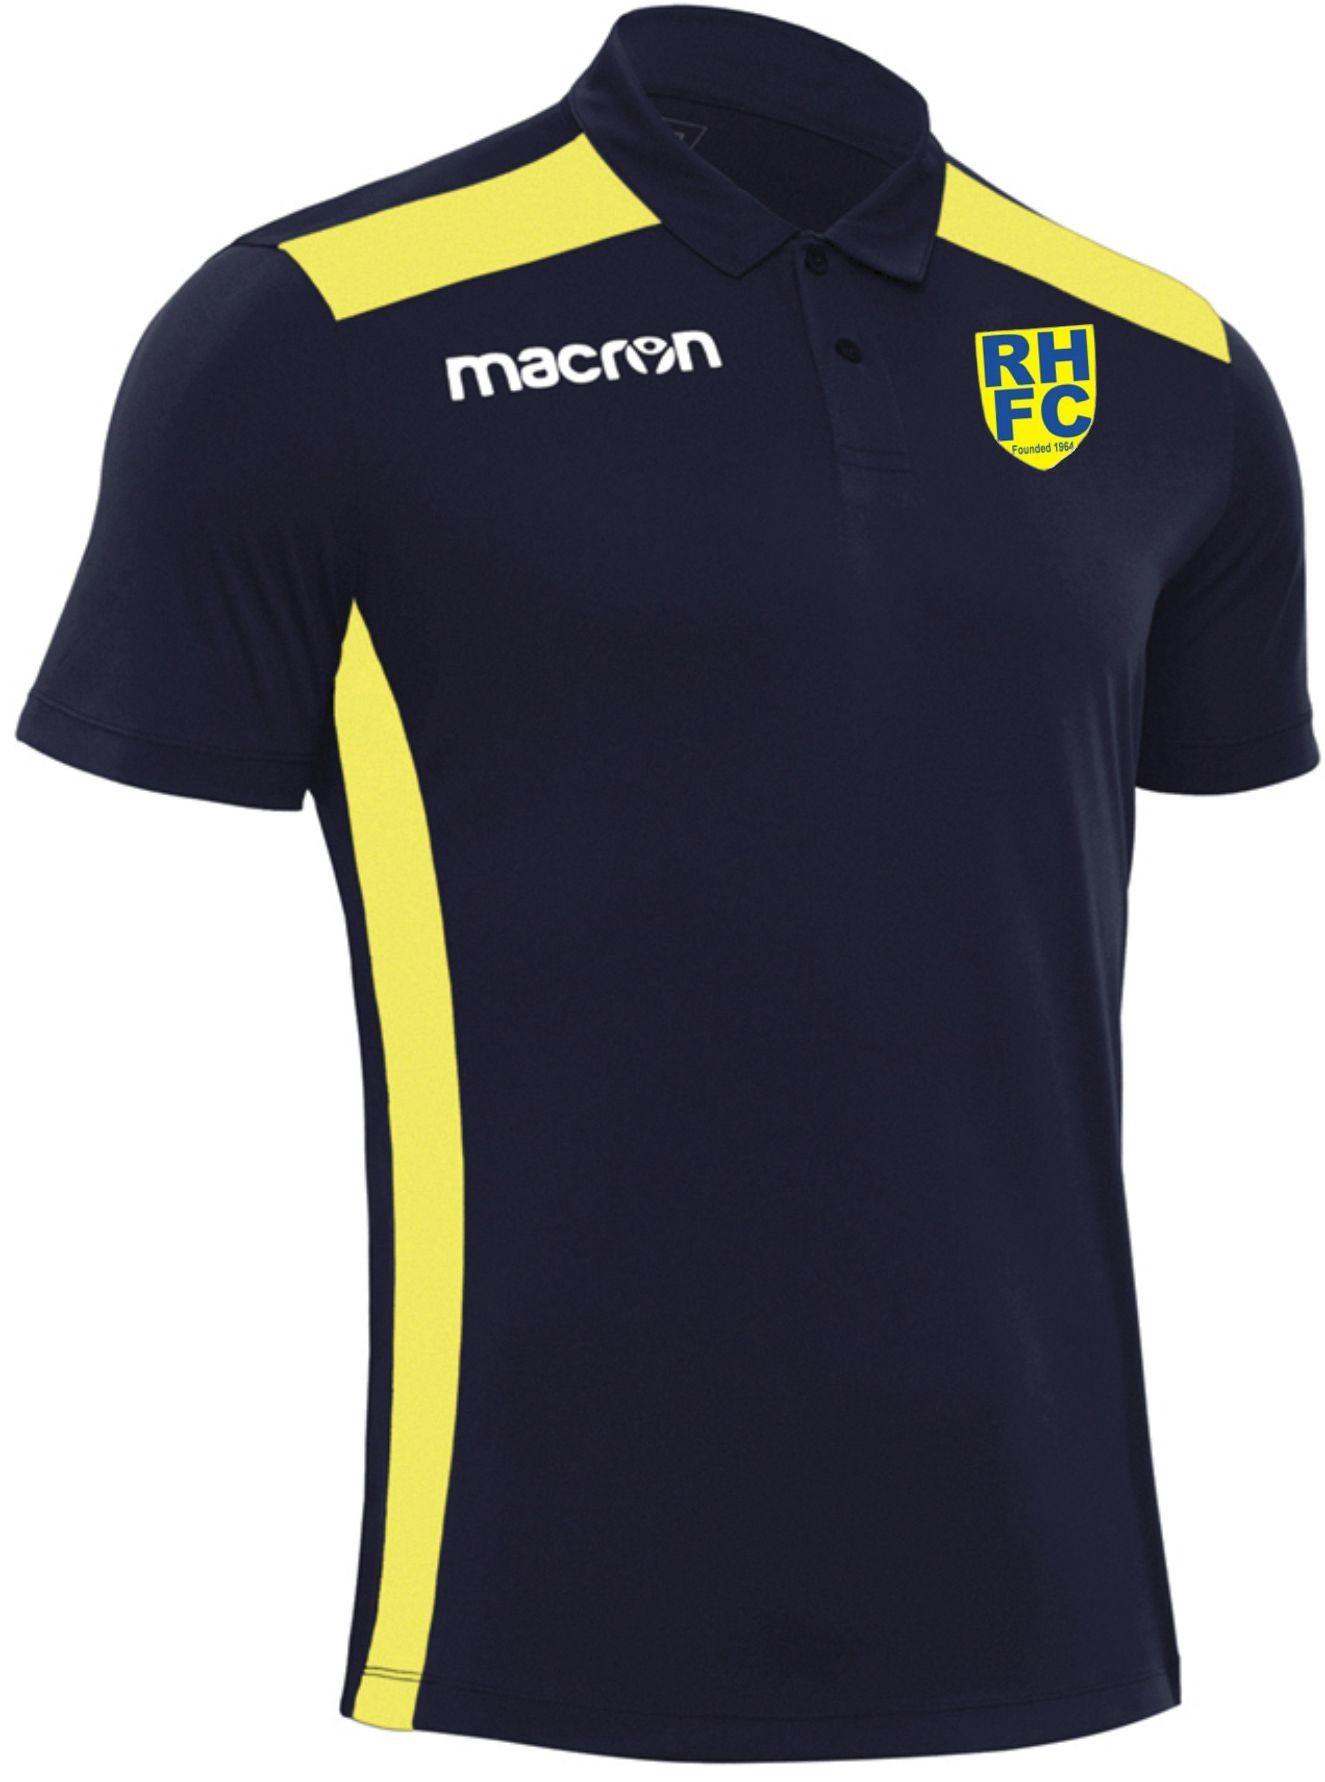 Runwell Sports Players Polo Shirt